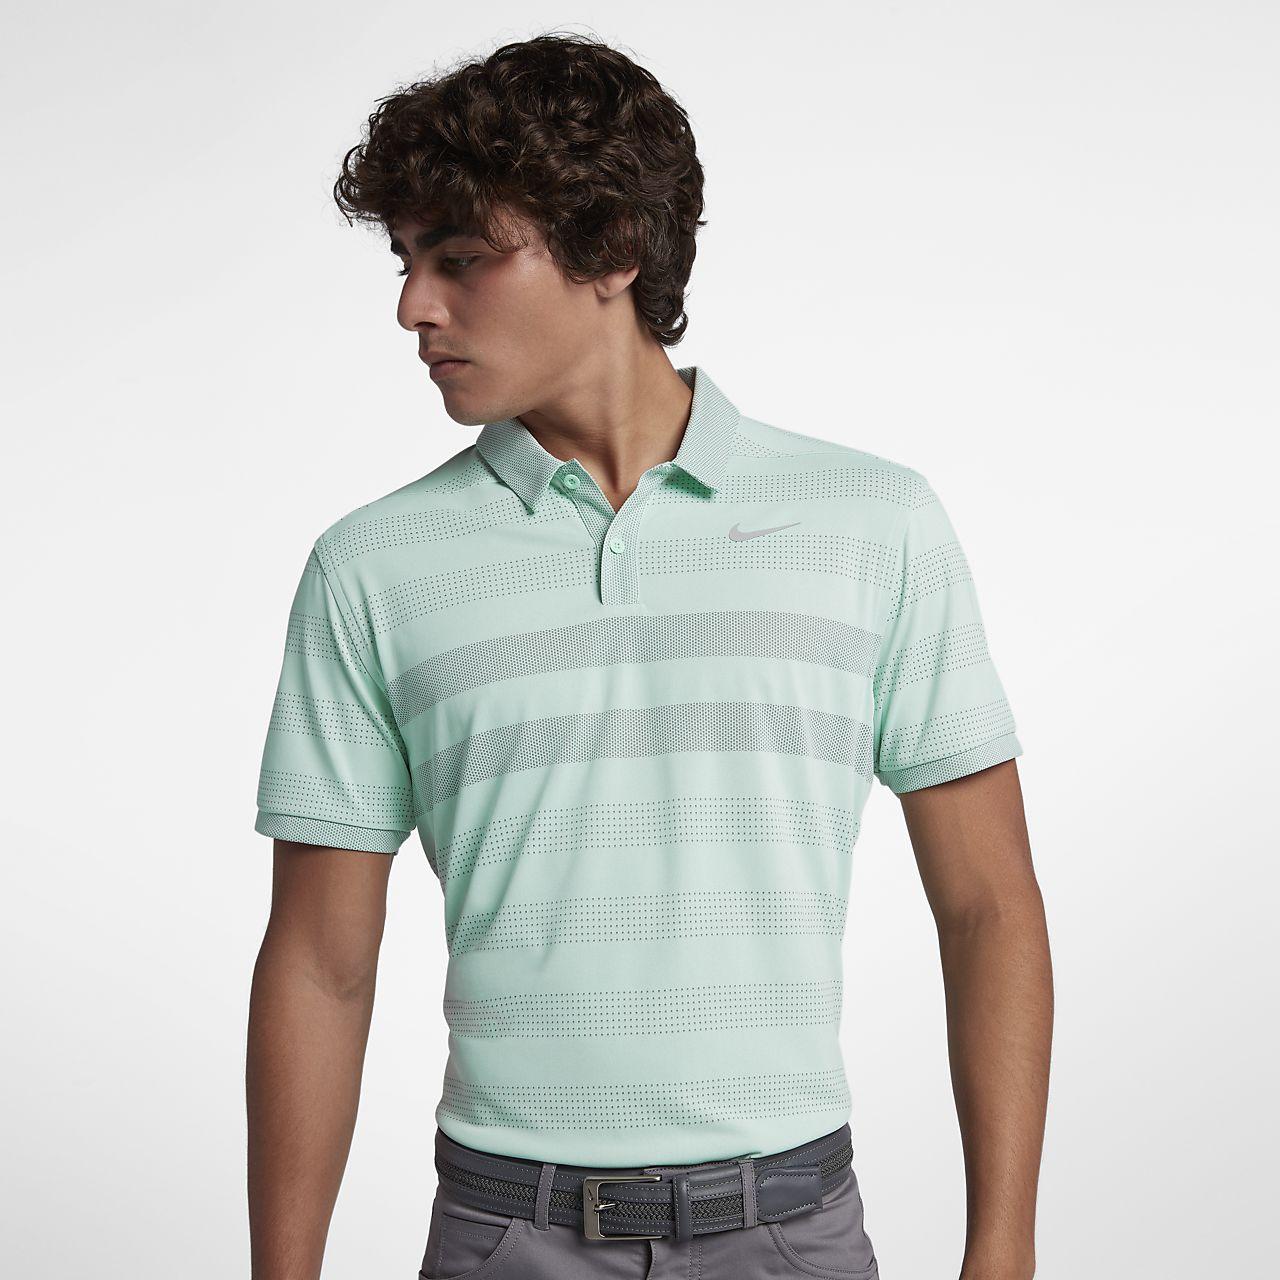 Nike TechKnit Cool Çizgili Erkek Golf Polo Üst